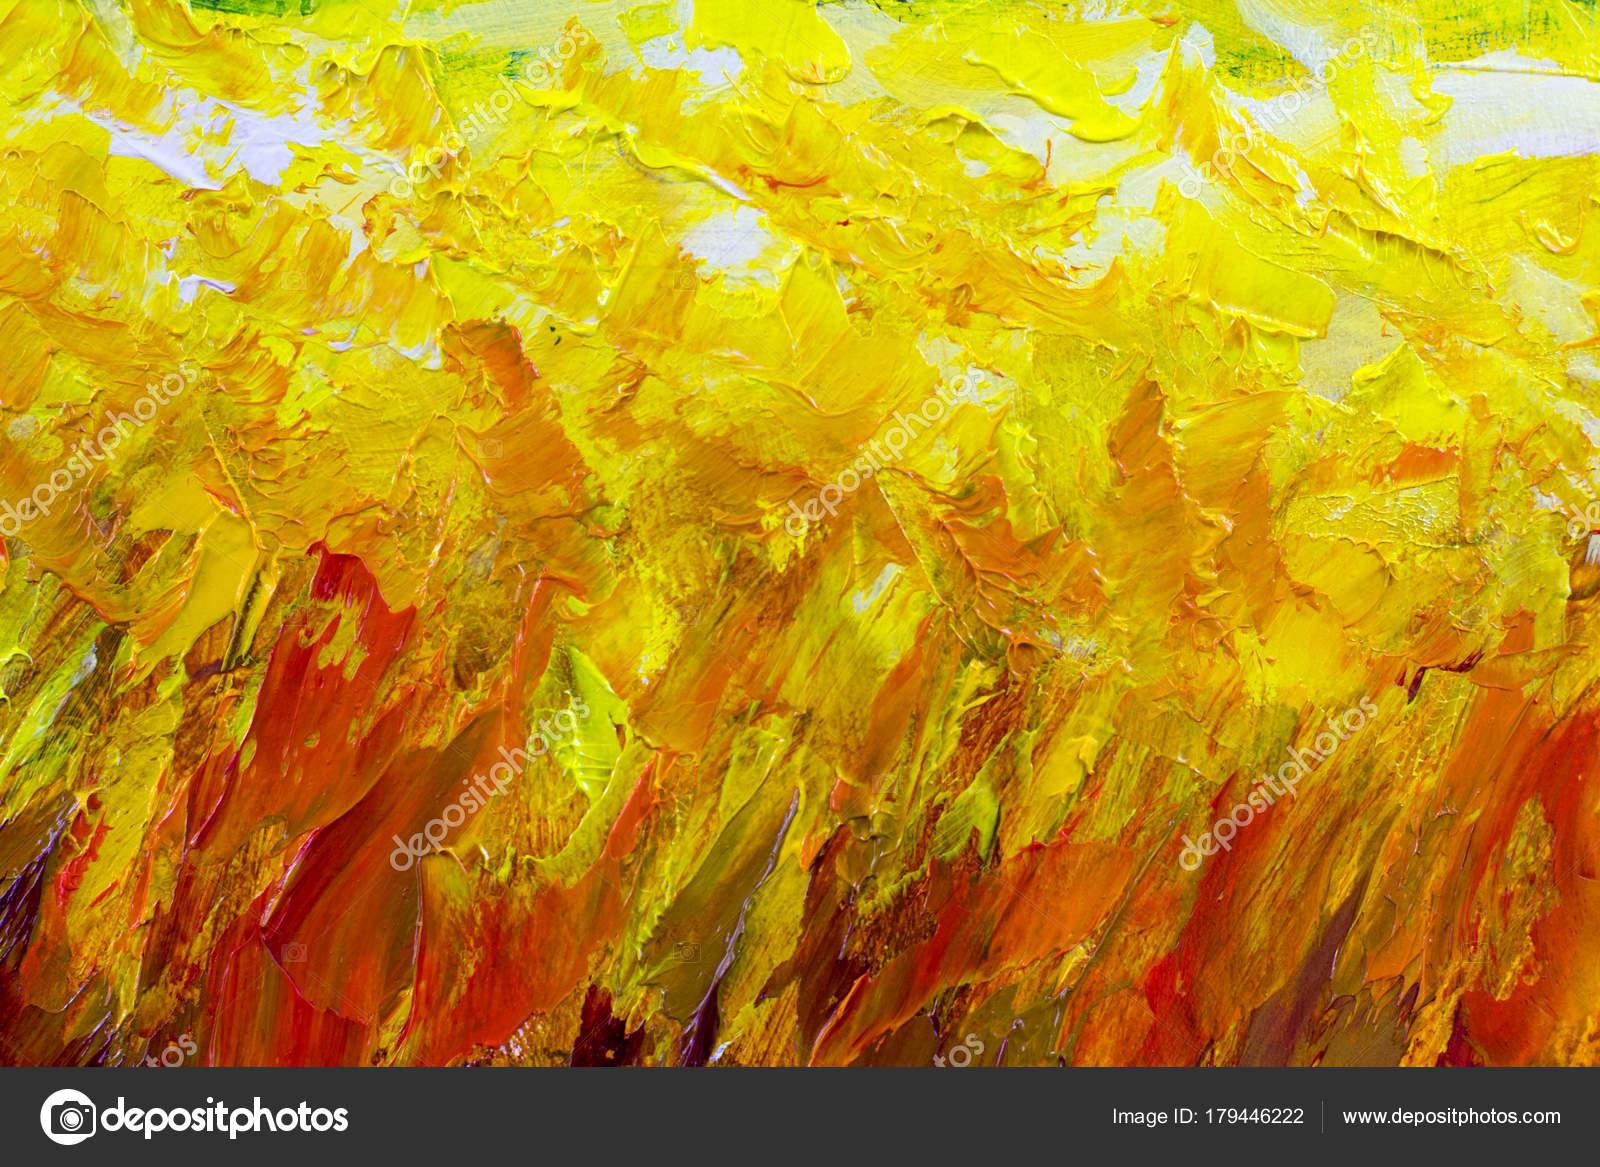 gelb orange rot feuer textur abstrakte malerei fragment vektor